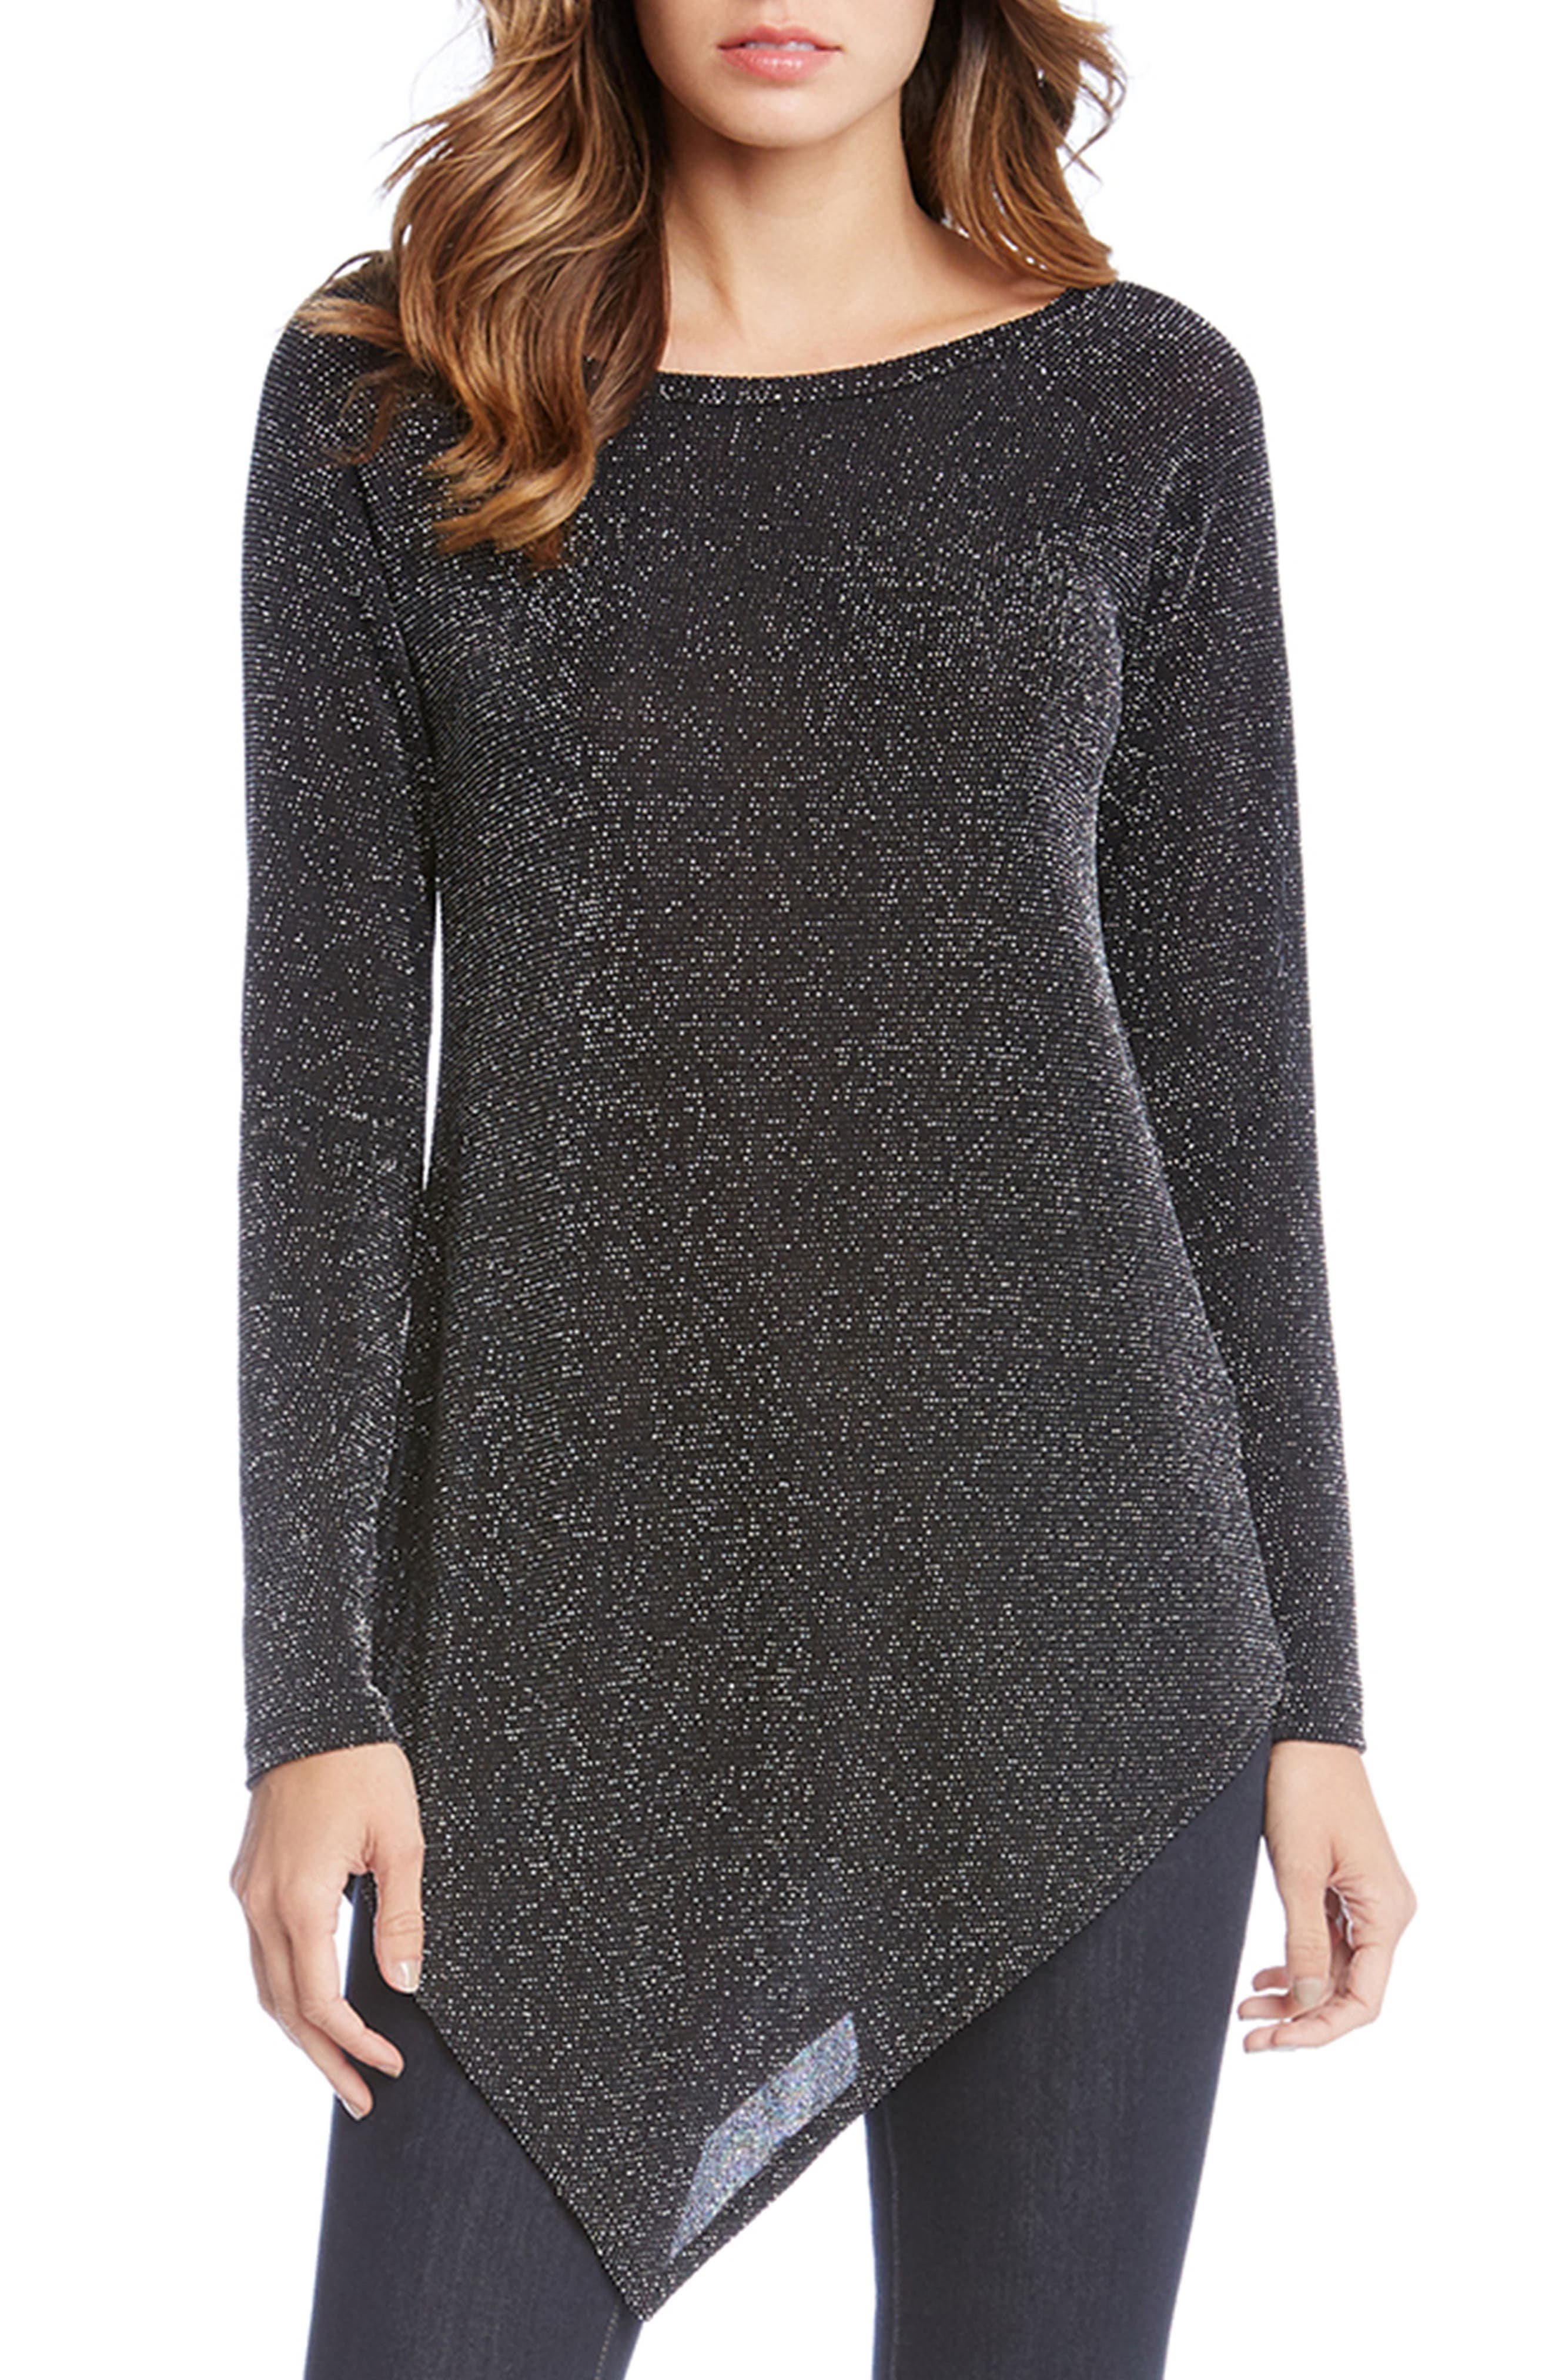 Karen Kane Asymmetrical Sparkle Knit Top